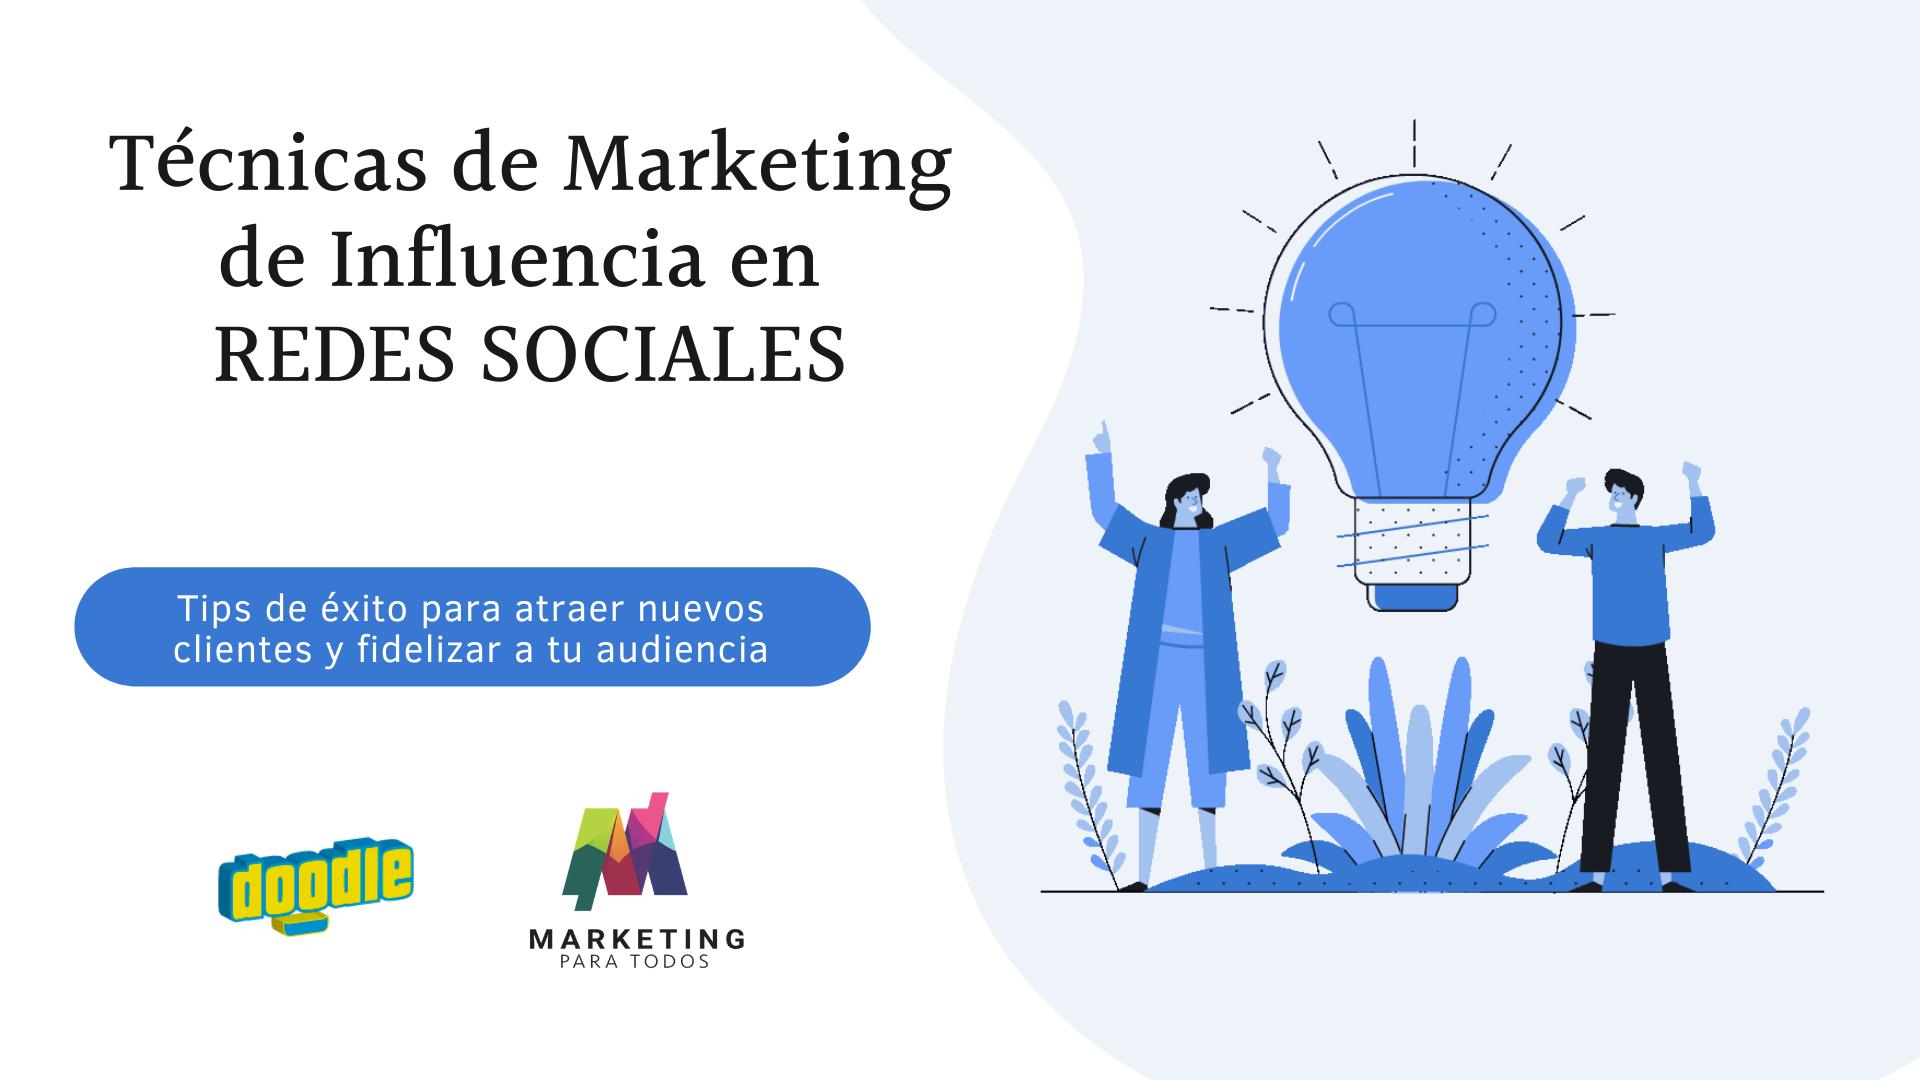 Técnicas de Marketing de Influencia en REDES SOCIALES (1)